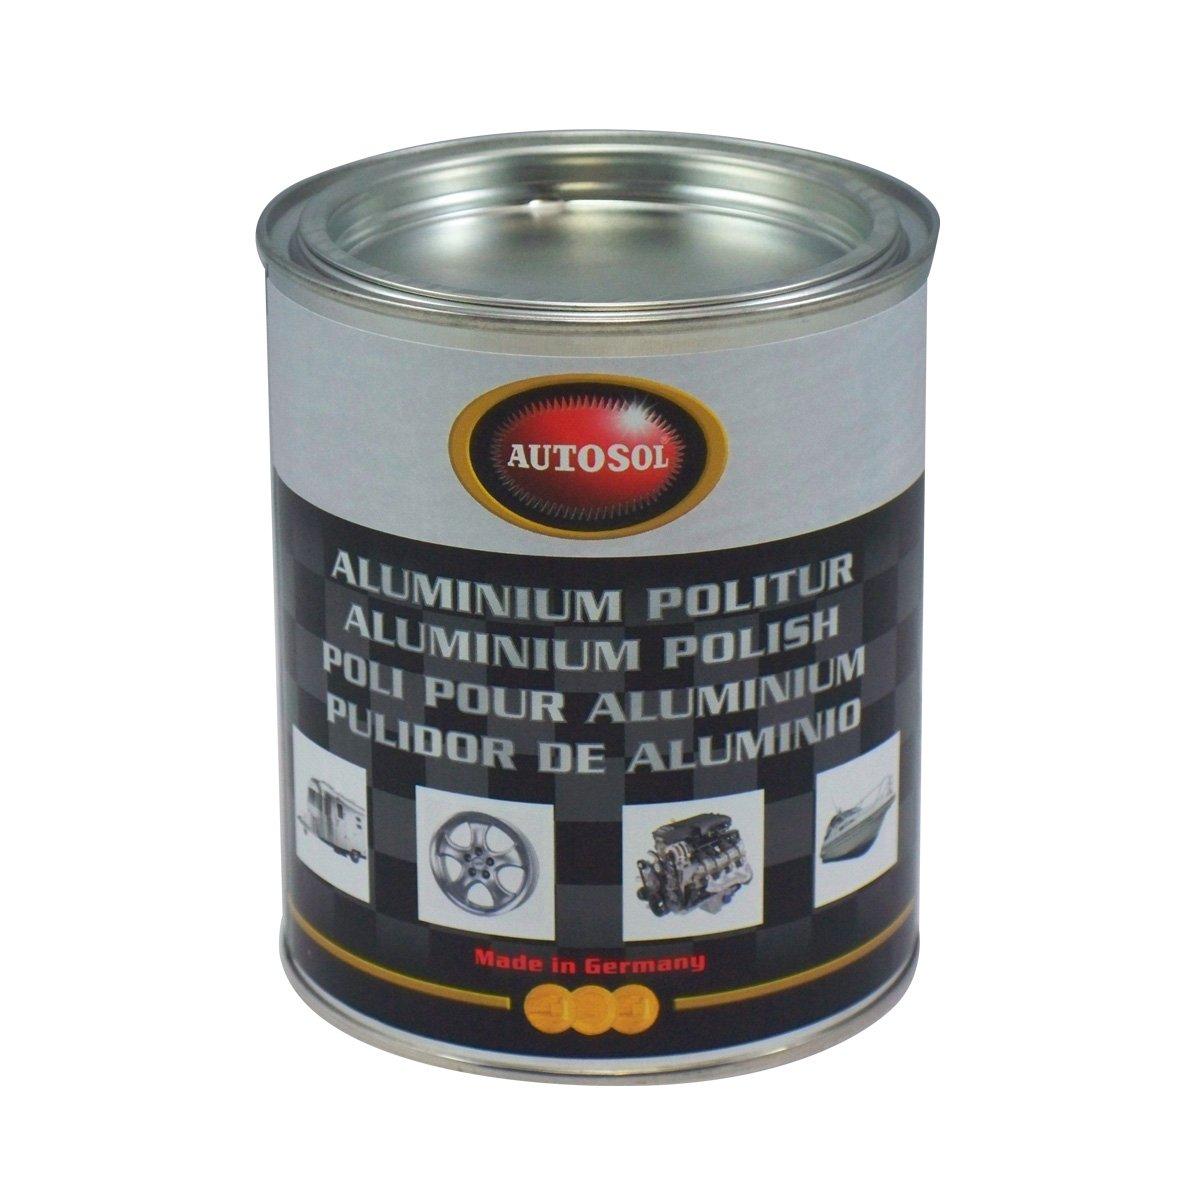 durable service autosol polissage 01 001831 aluminium 750. Black Bedroom Furniture Sets. Home Design Ideas